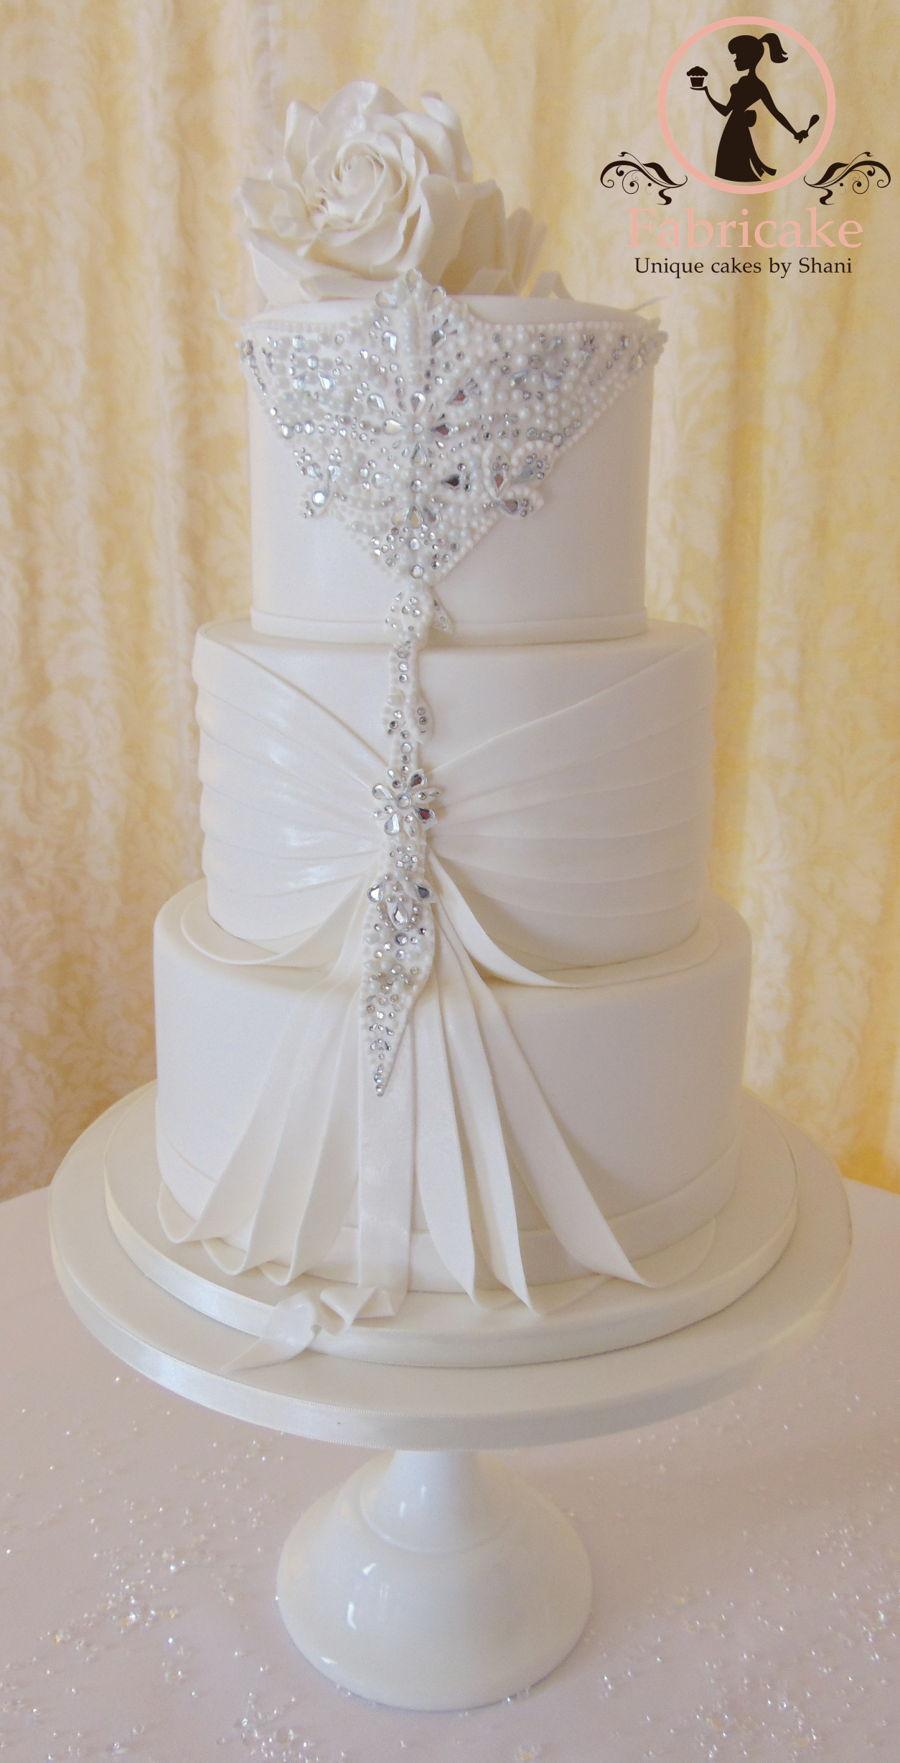 Bling Wedding Cake - CakeCentral.com